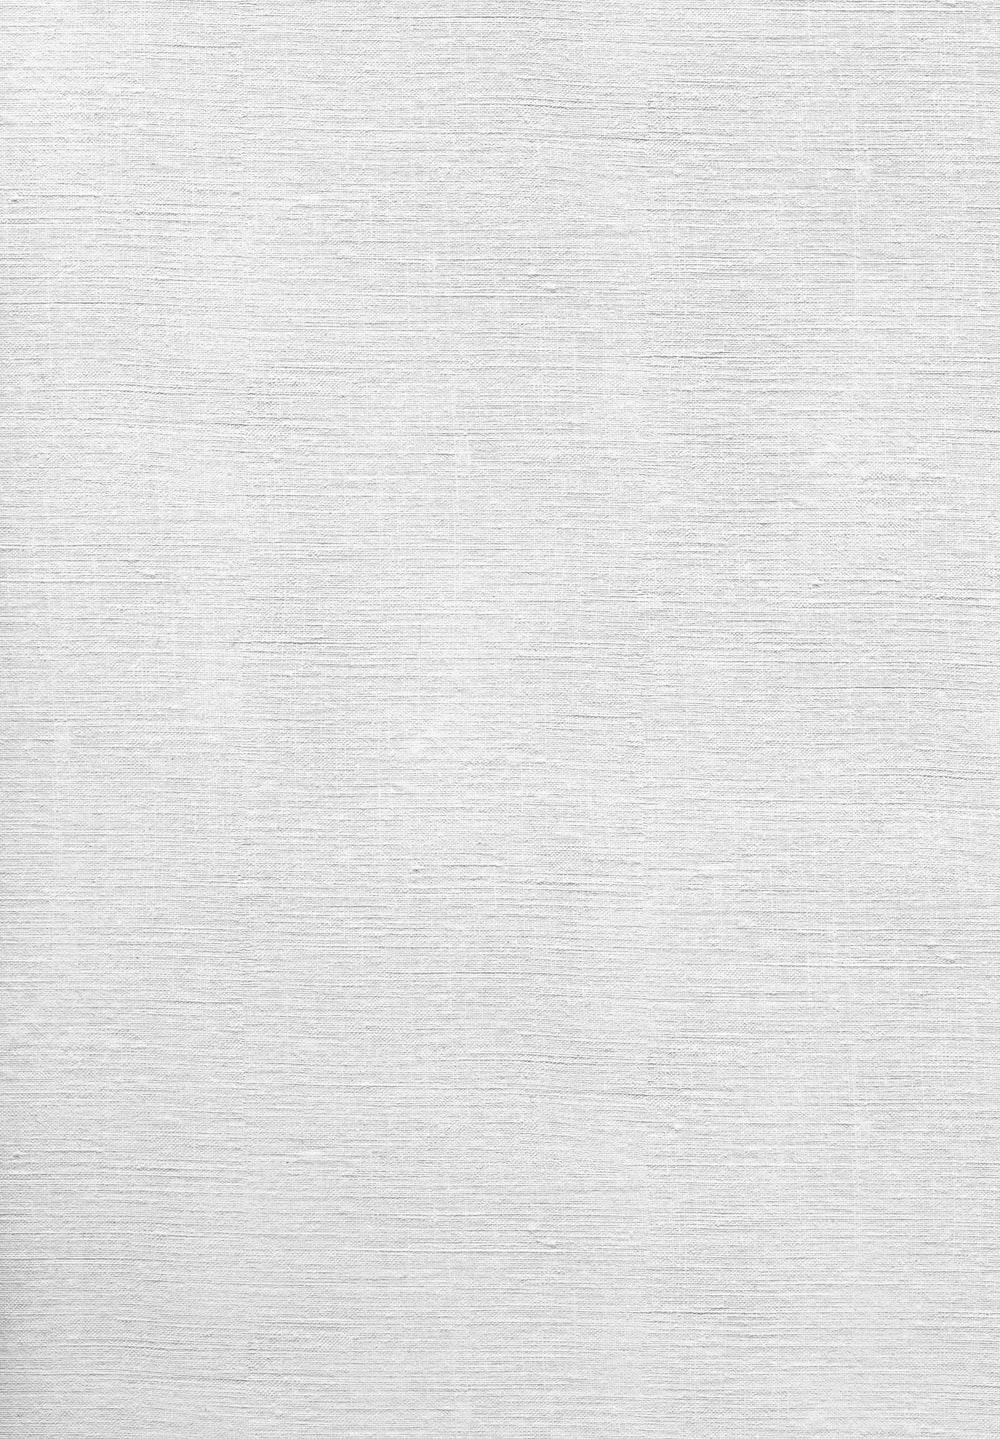 white textile with black shadow